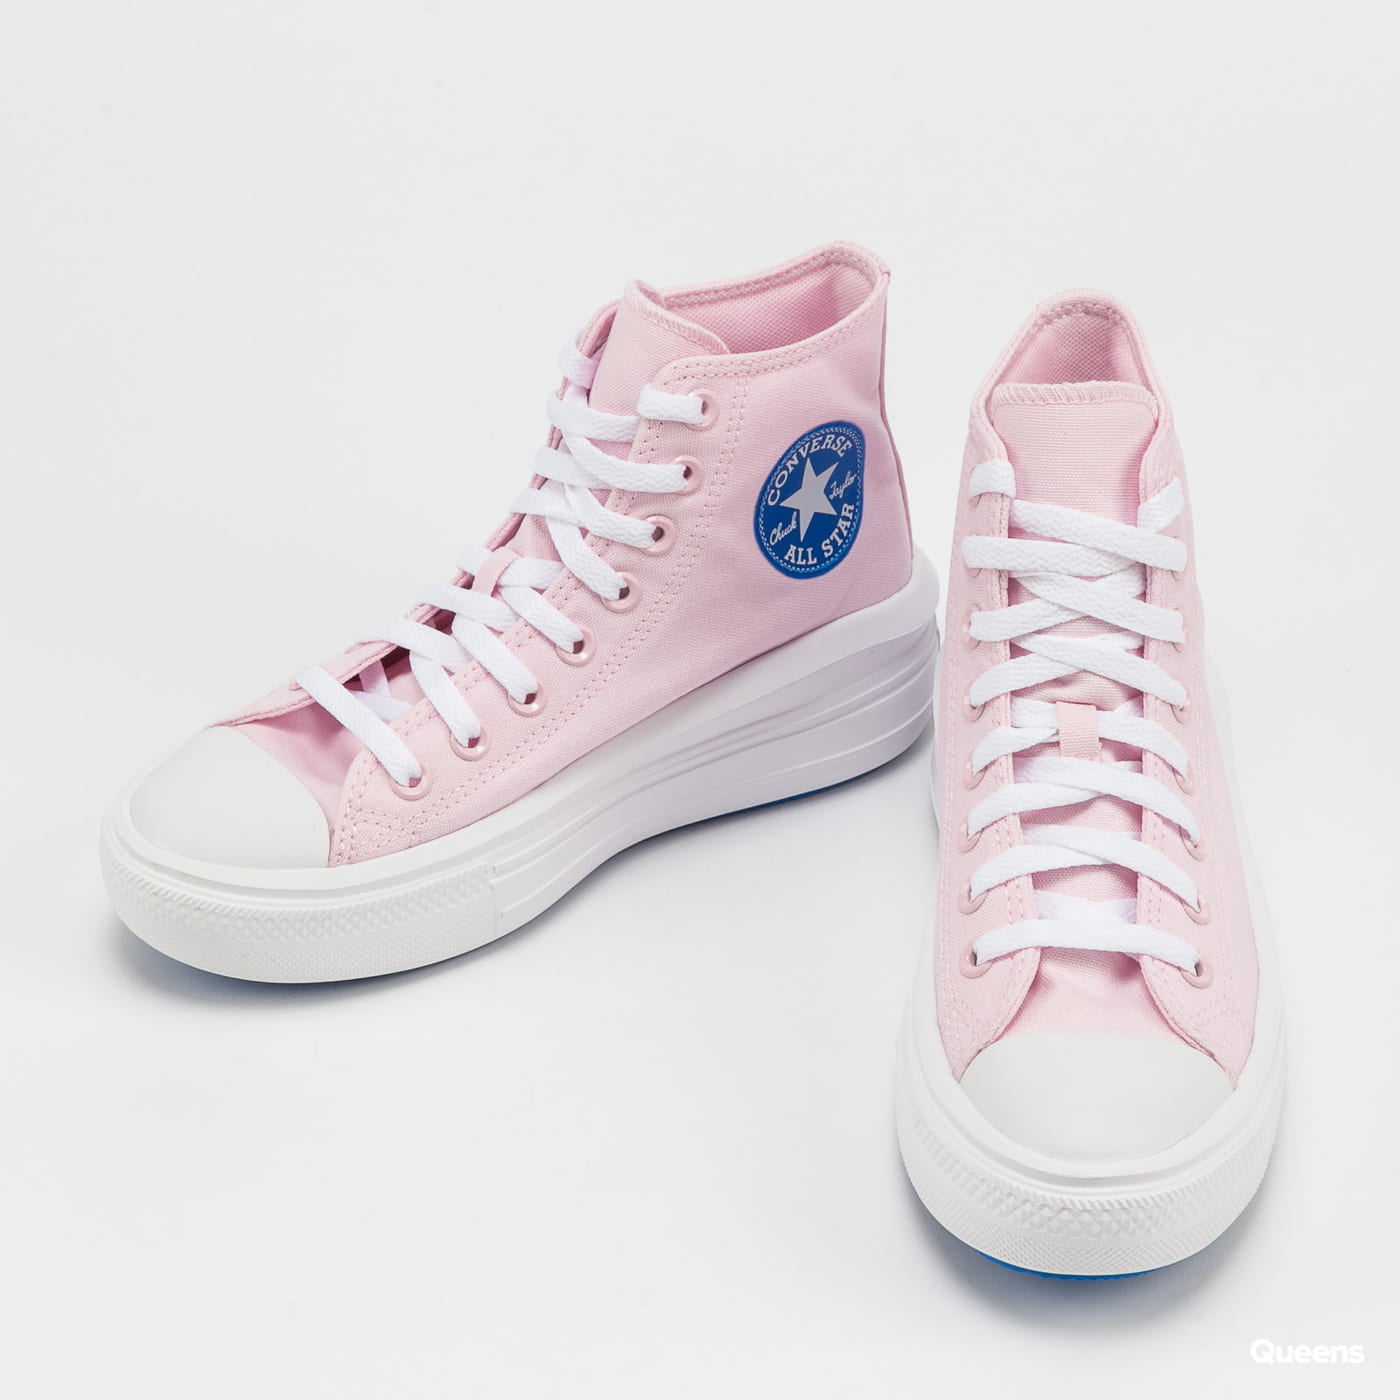 Converse Chuck Taylor All Star Move Hi pink foam / digital blue / white